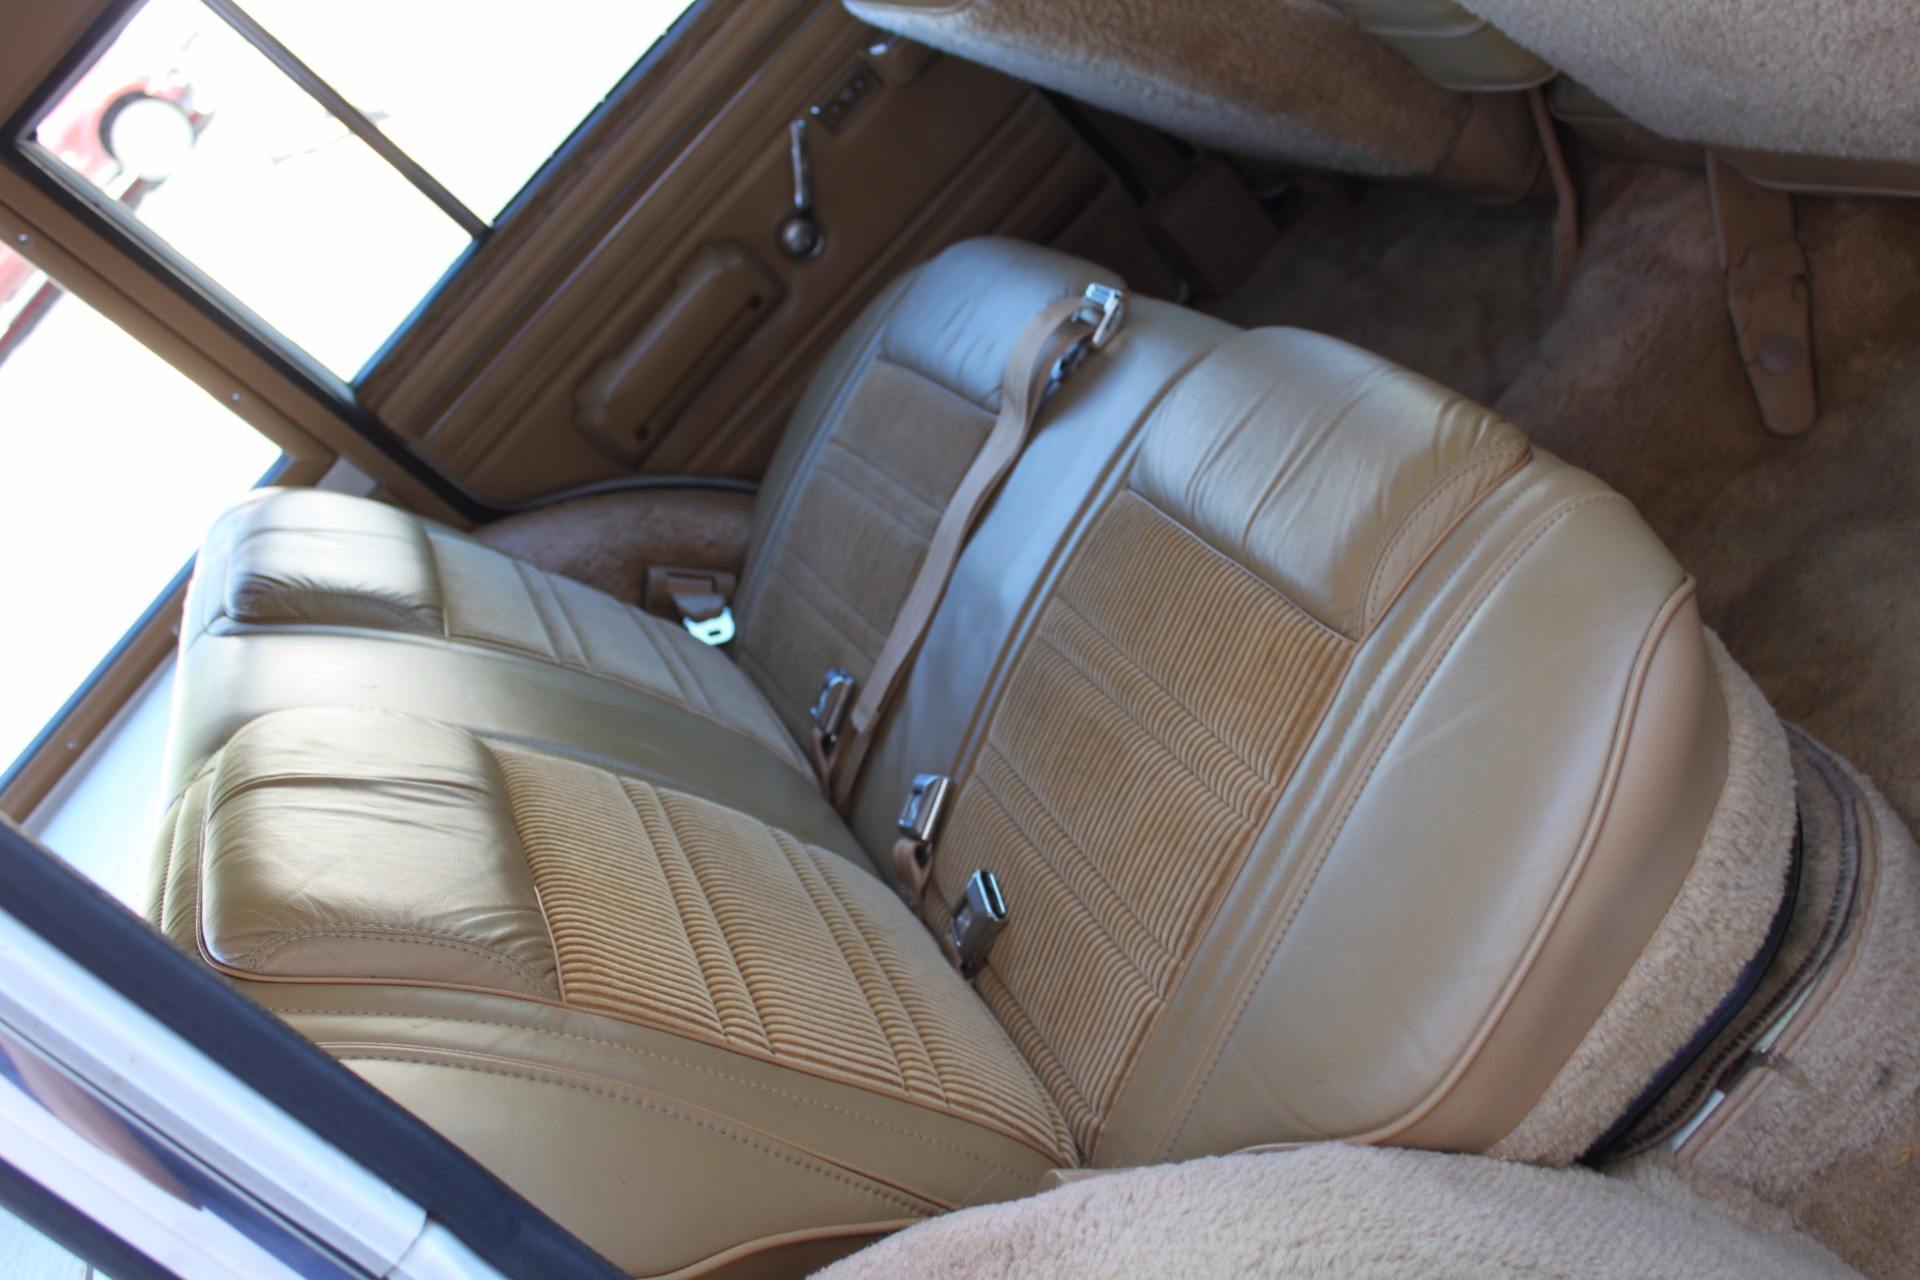 Used-1988-Jeep-Grand-Wagoneer-Limited-4X4-Land-Cruiser